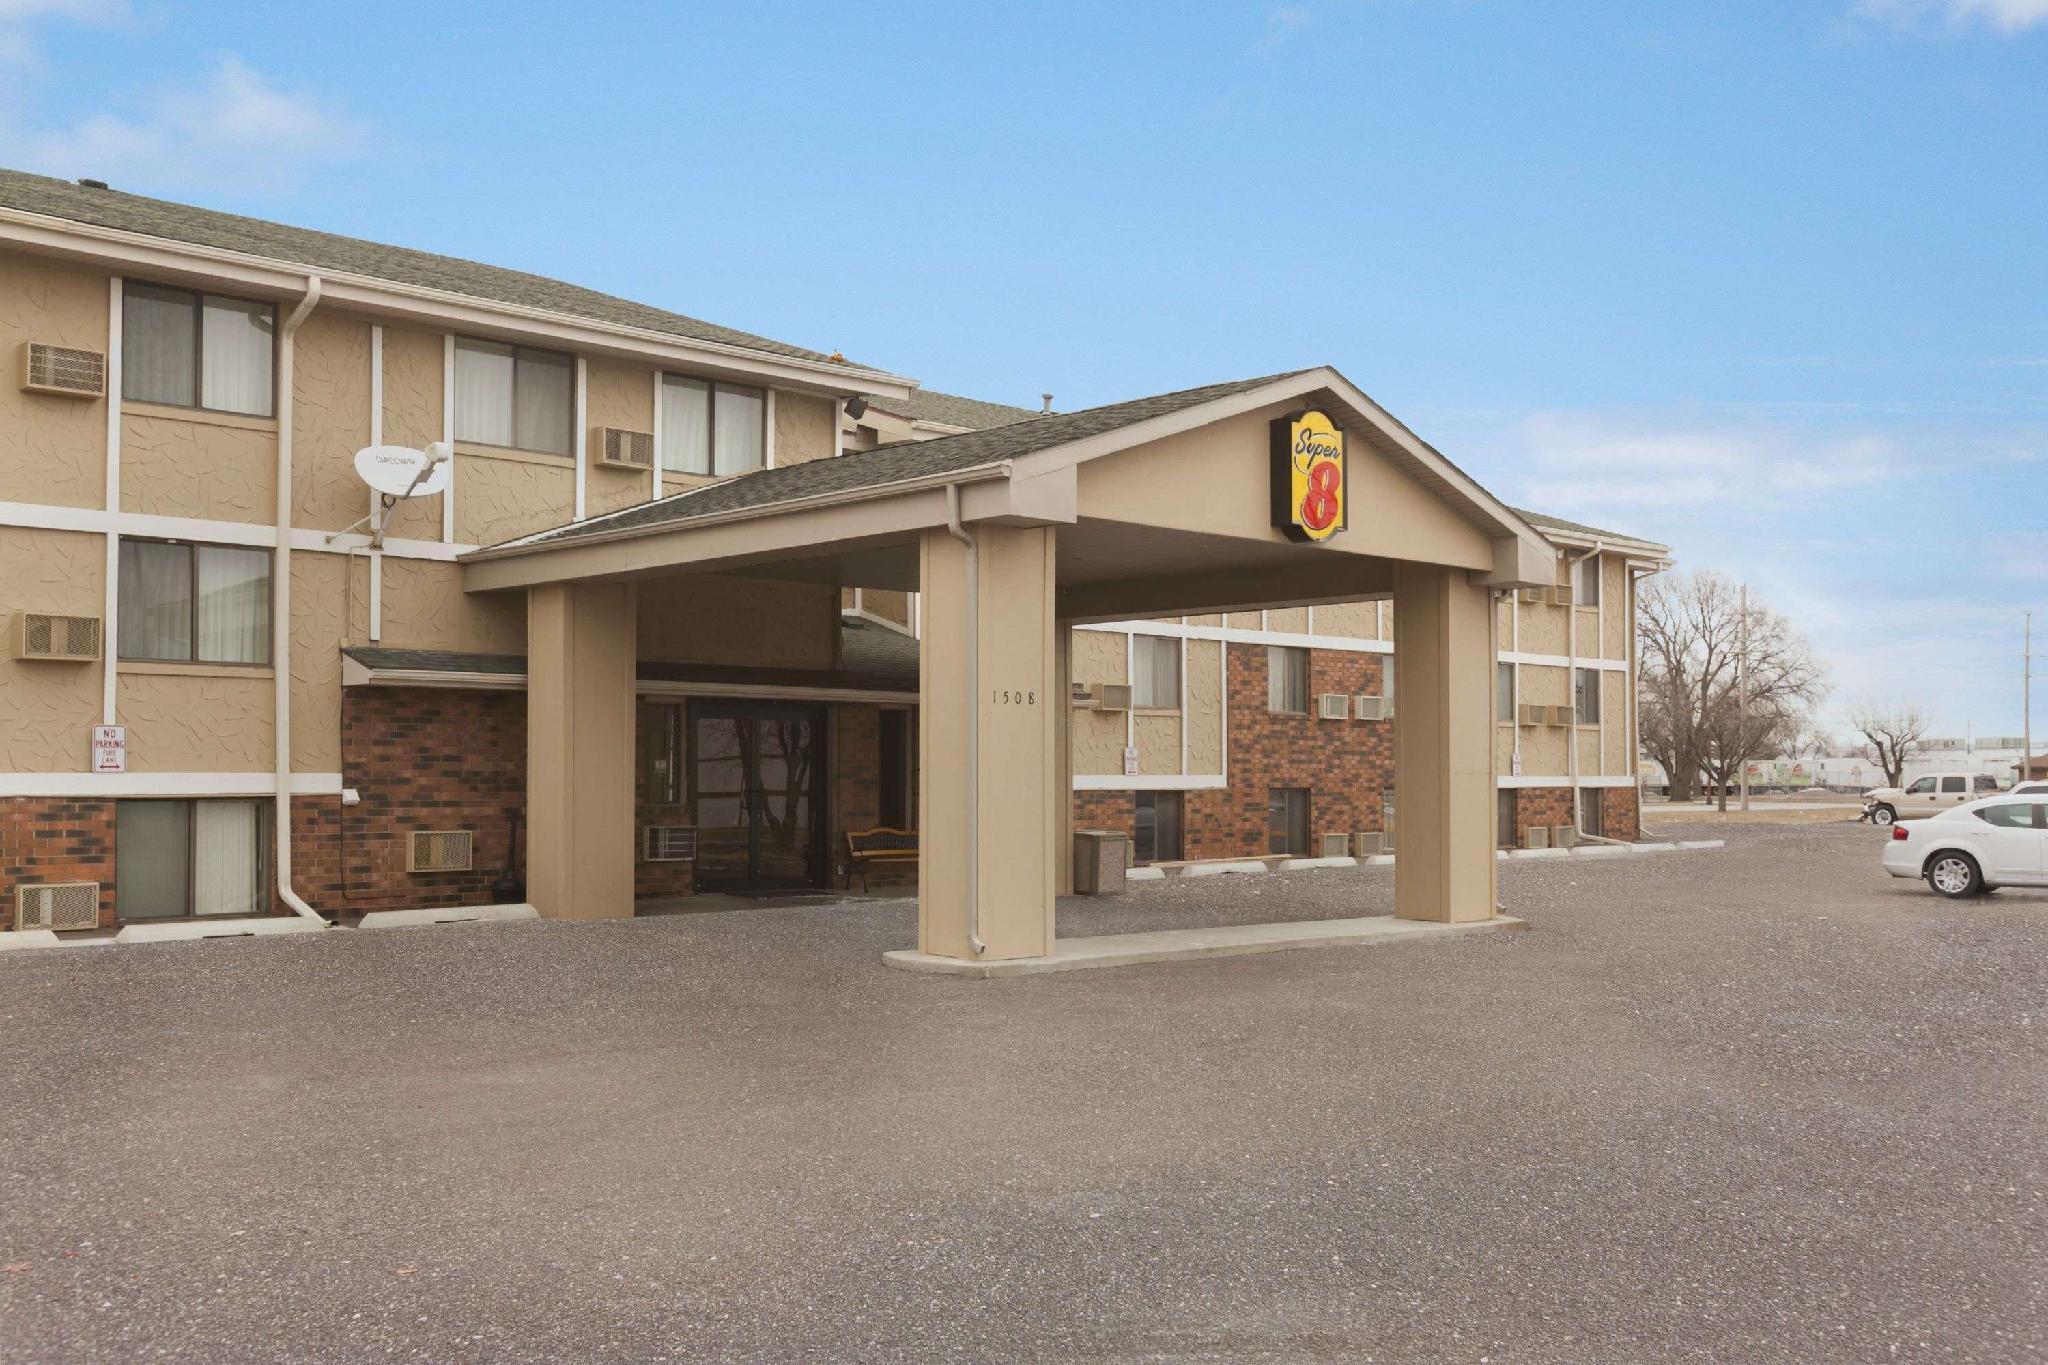 Super 8 By Wyndham Sioux Falls Near Convention Center